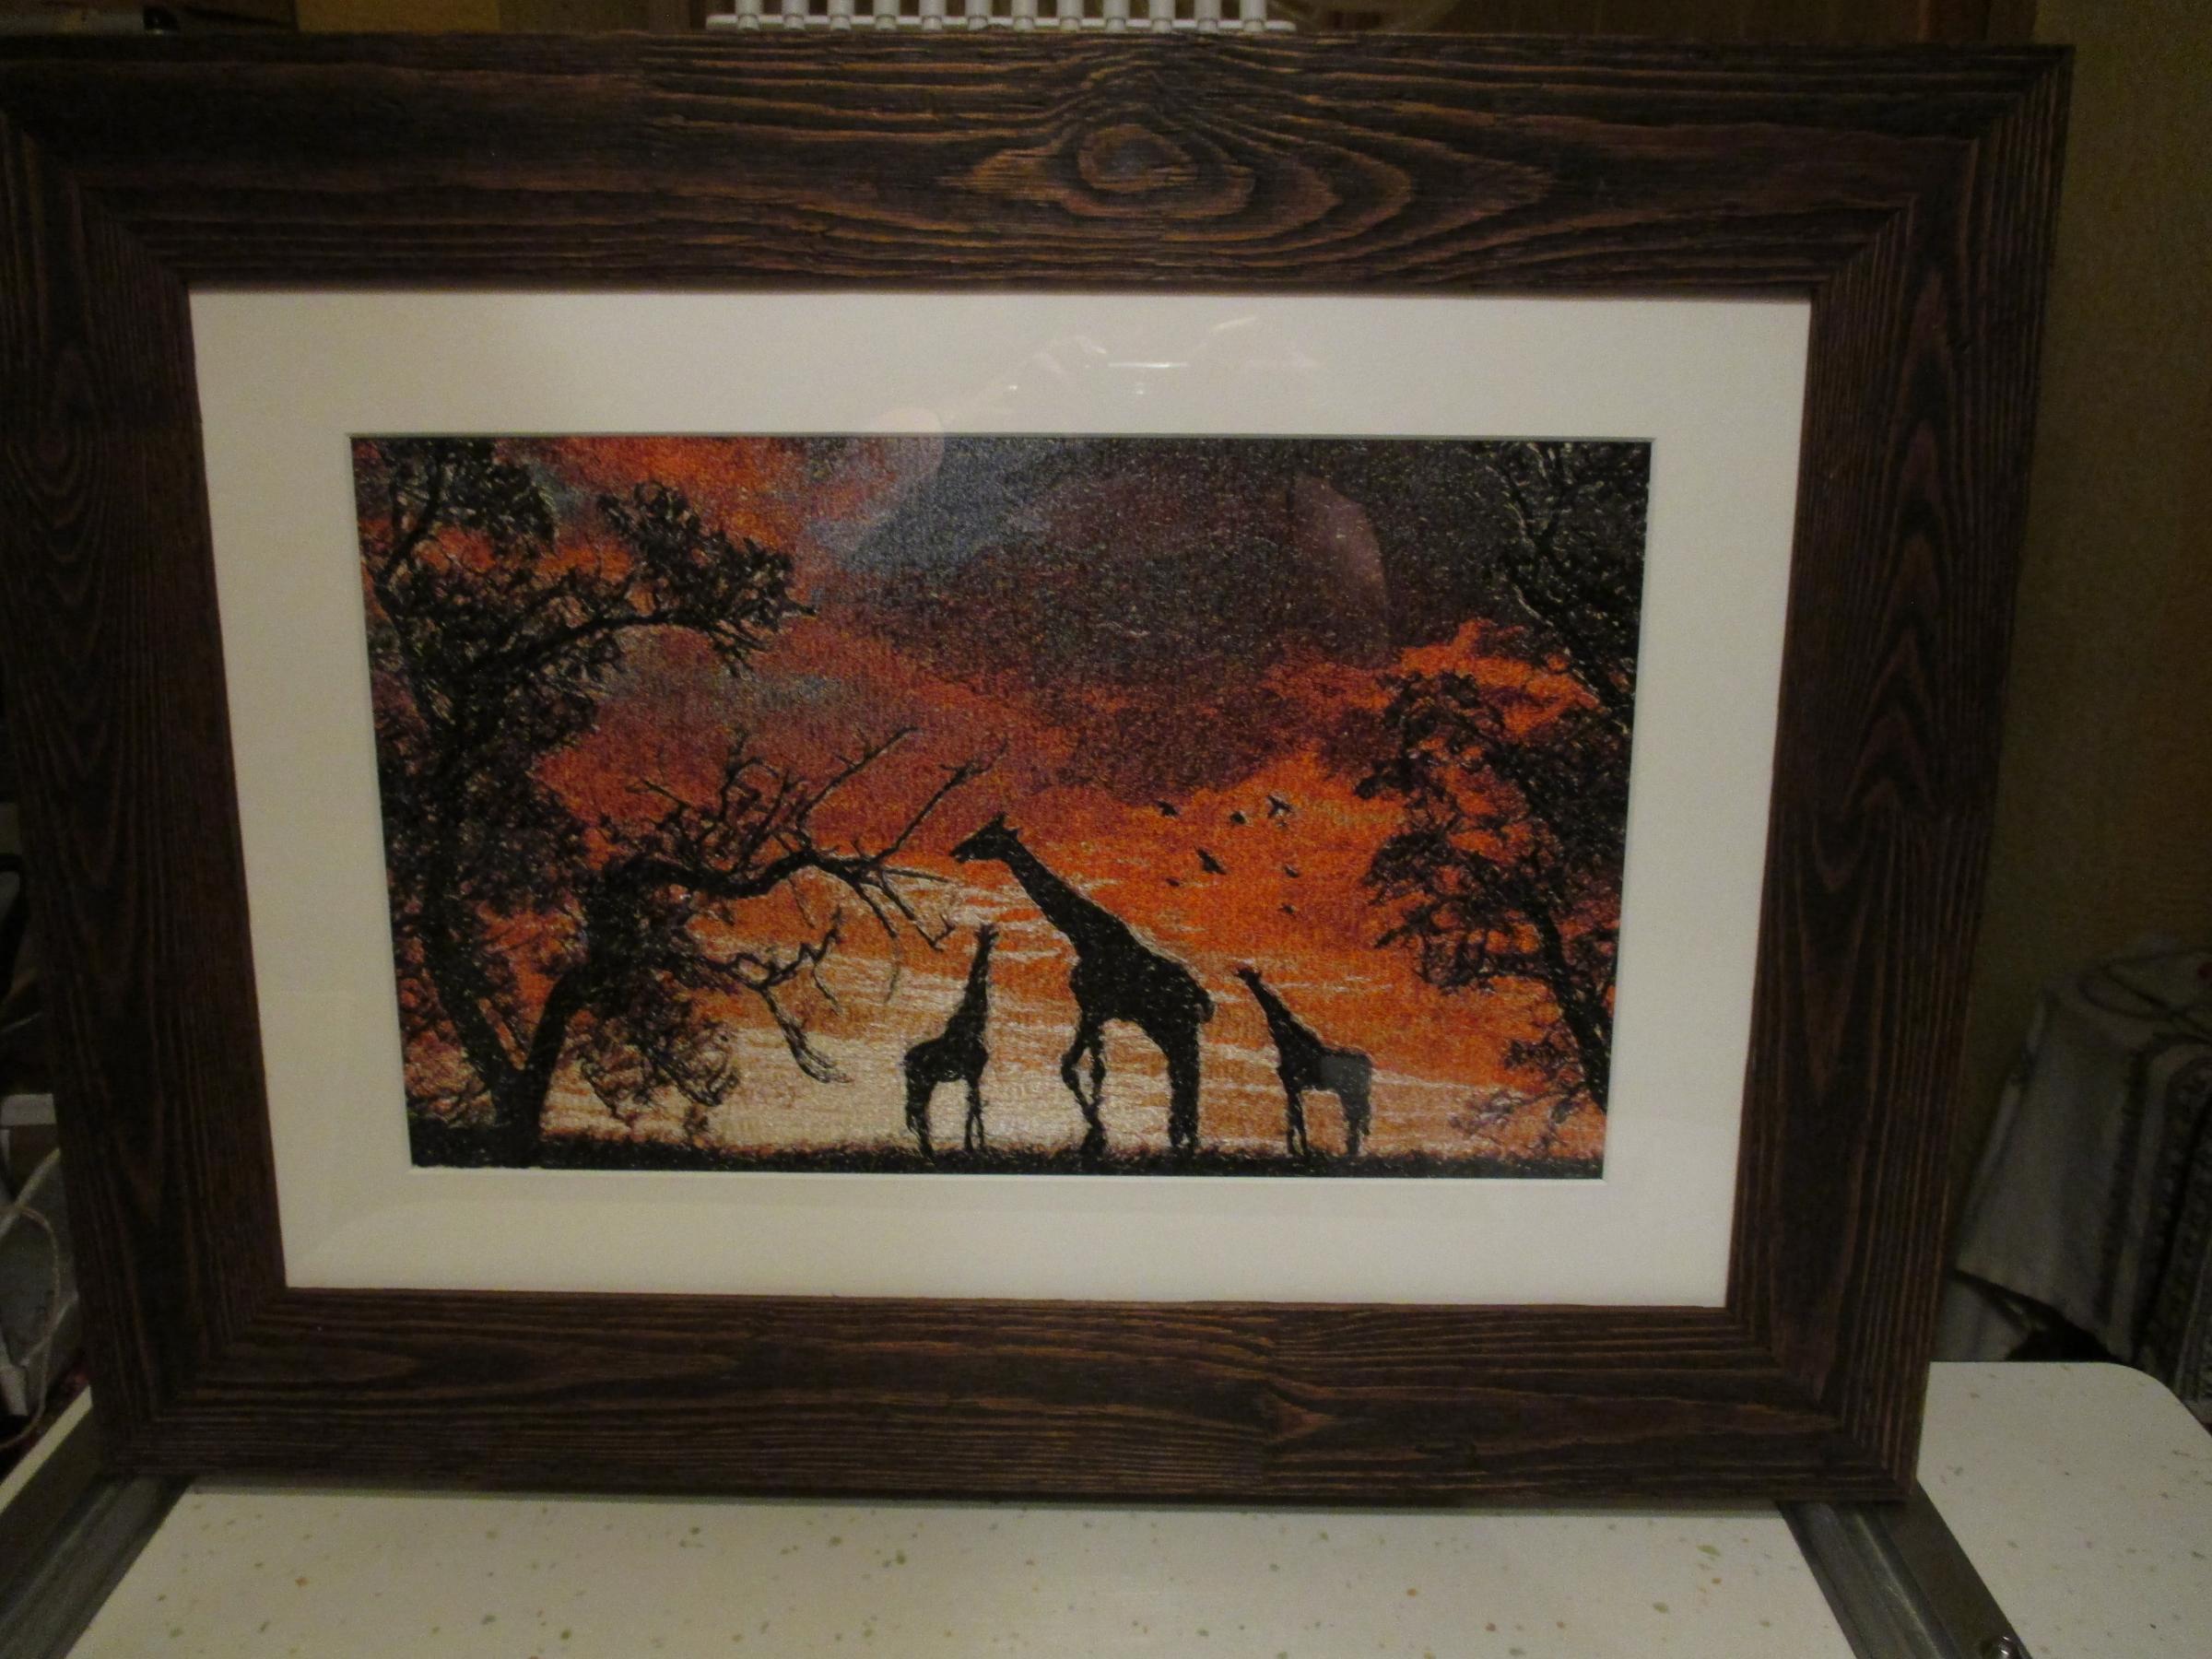 Africa sunset photo stitch embroidery design